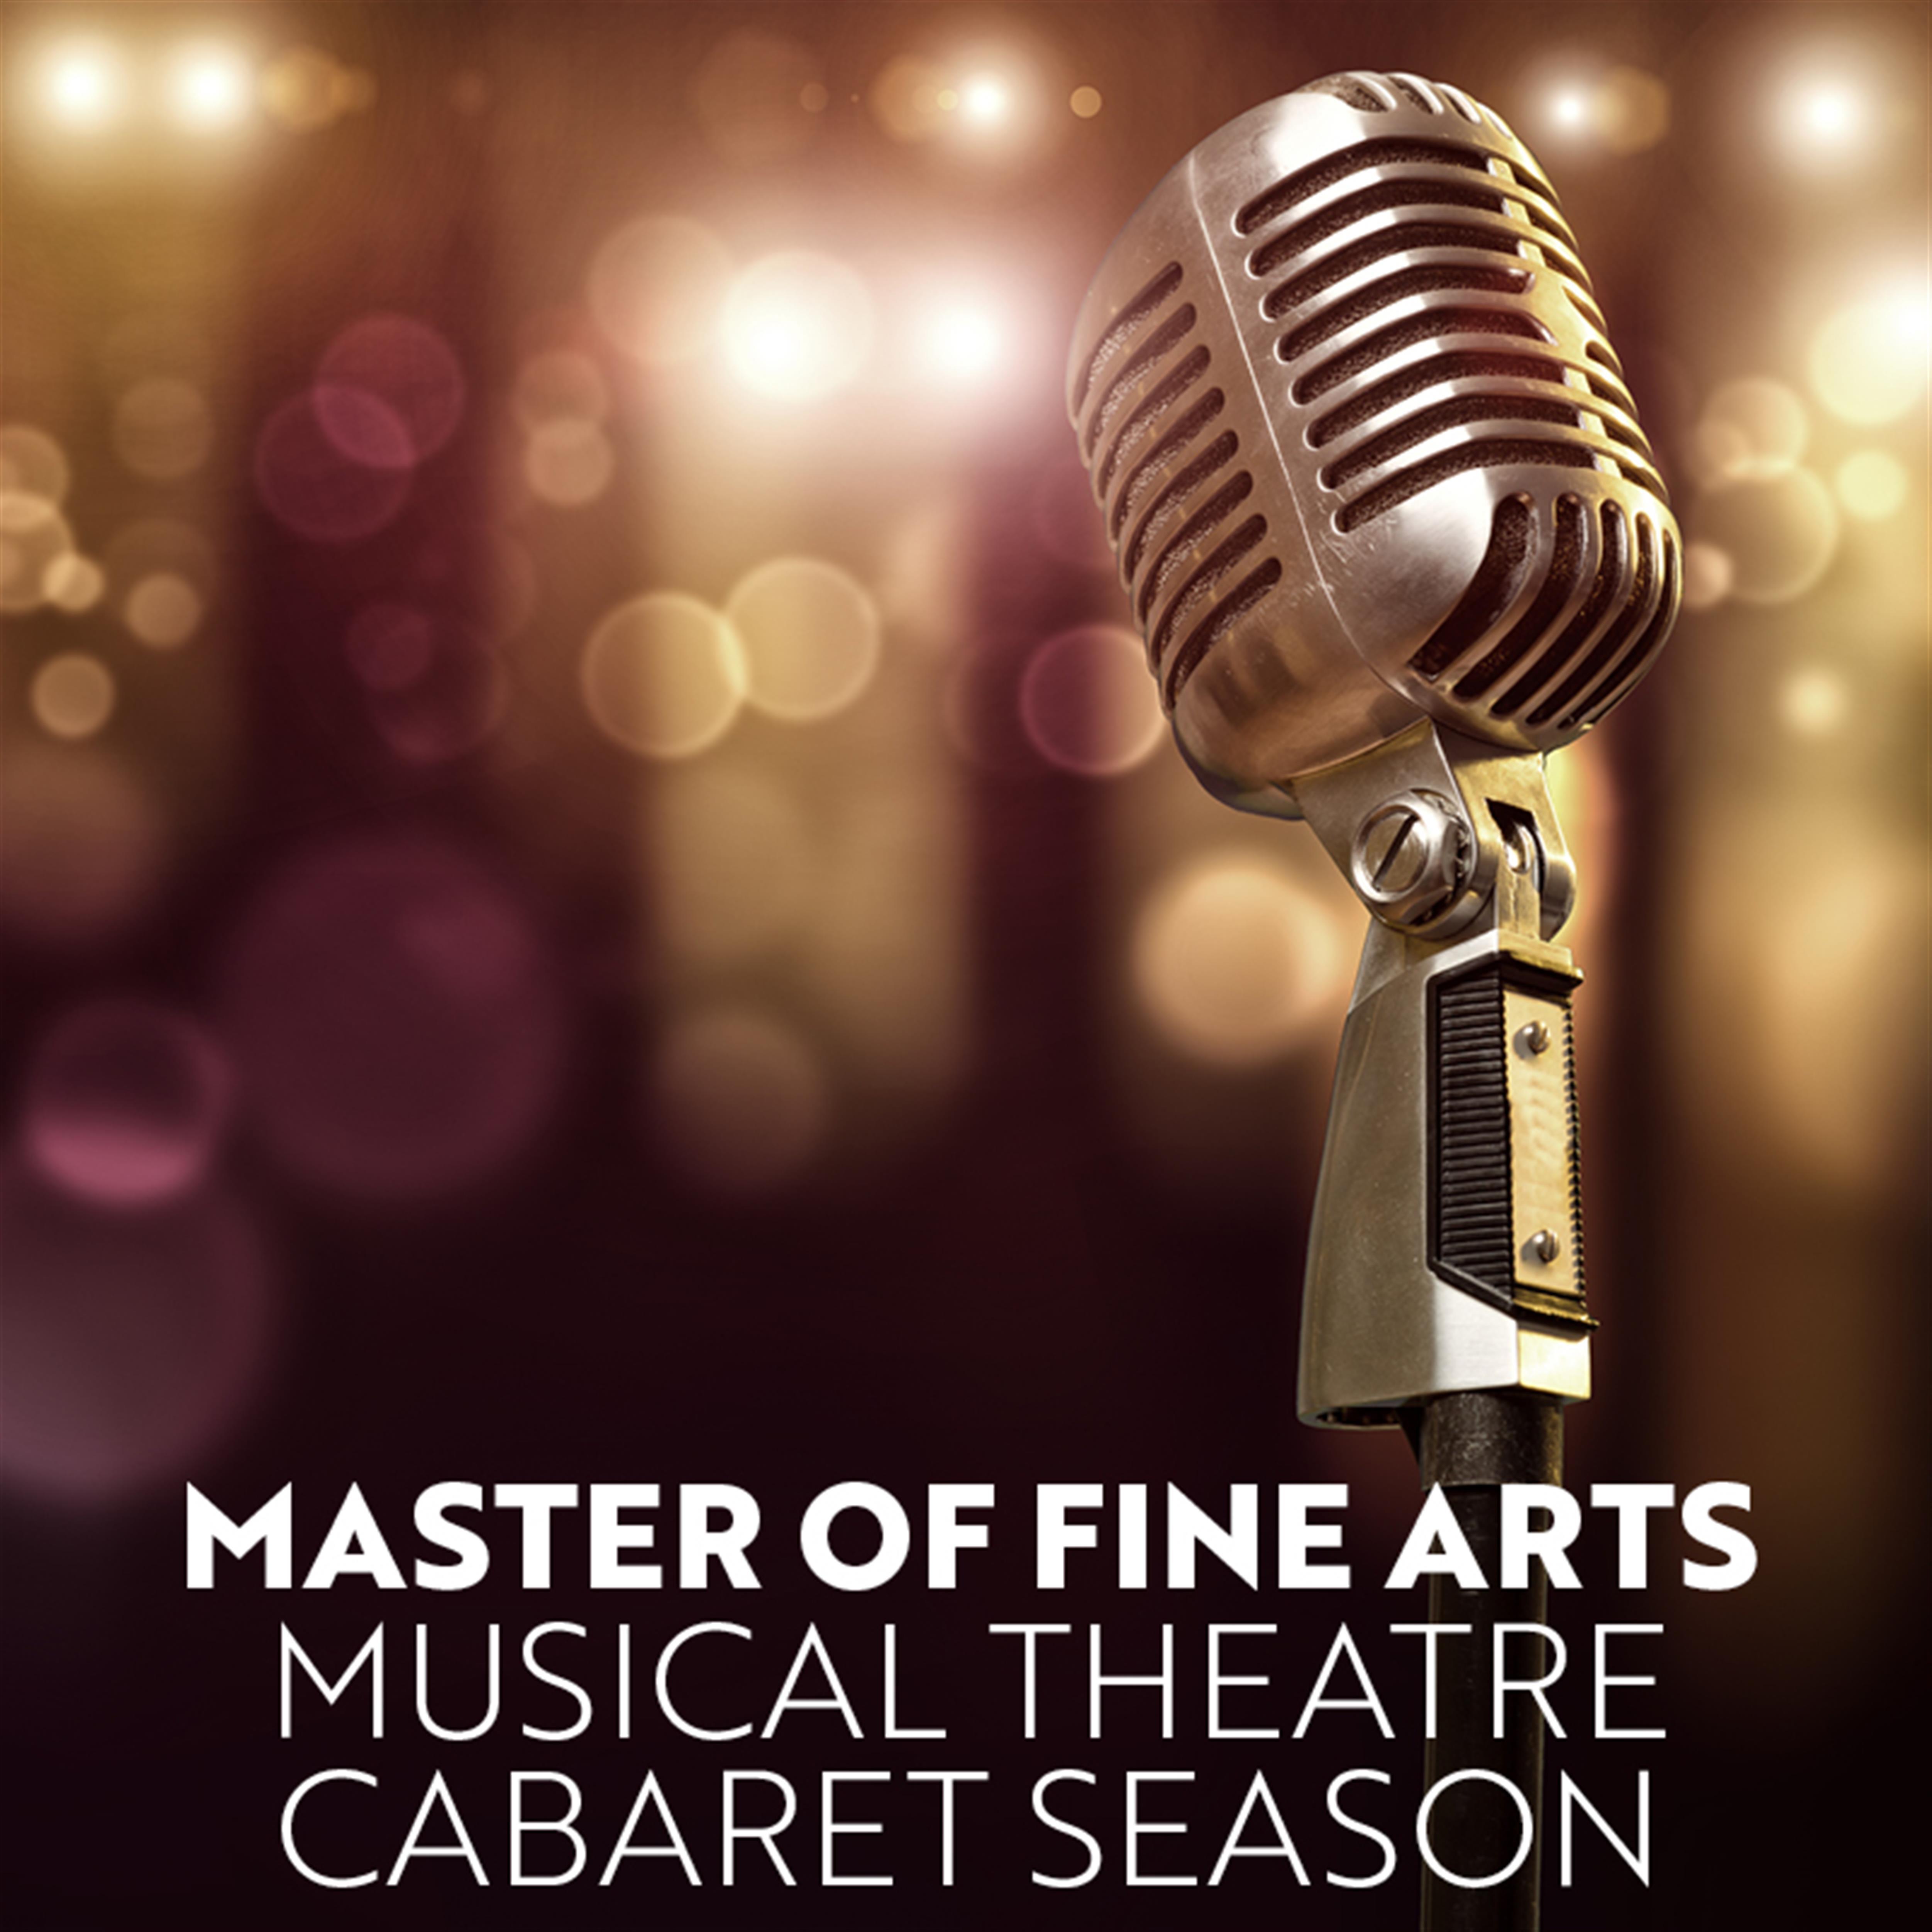 MT Cabaret Season - A Decade of Change (MFA)